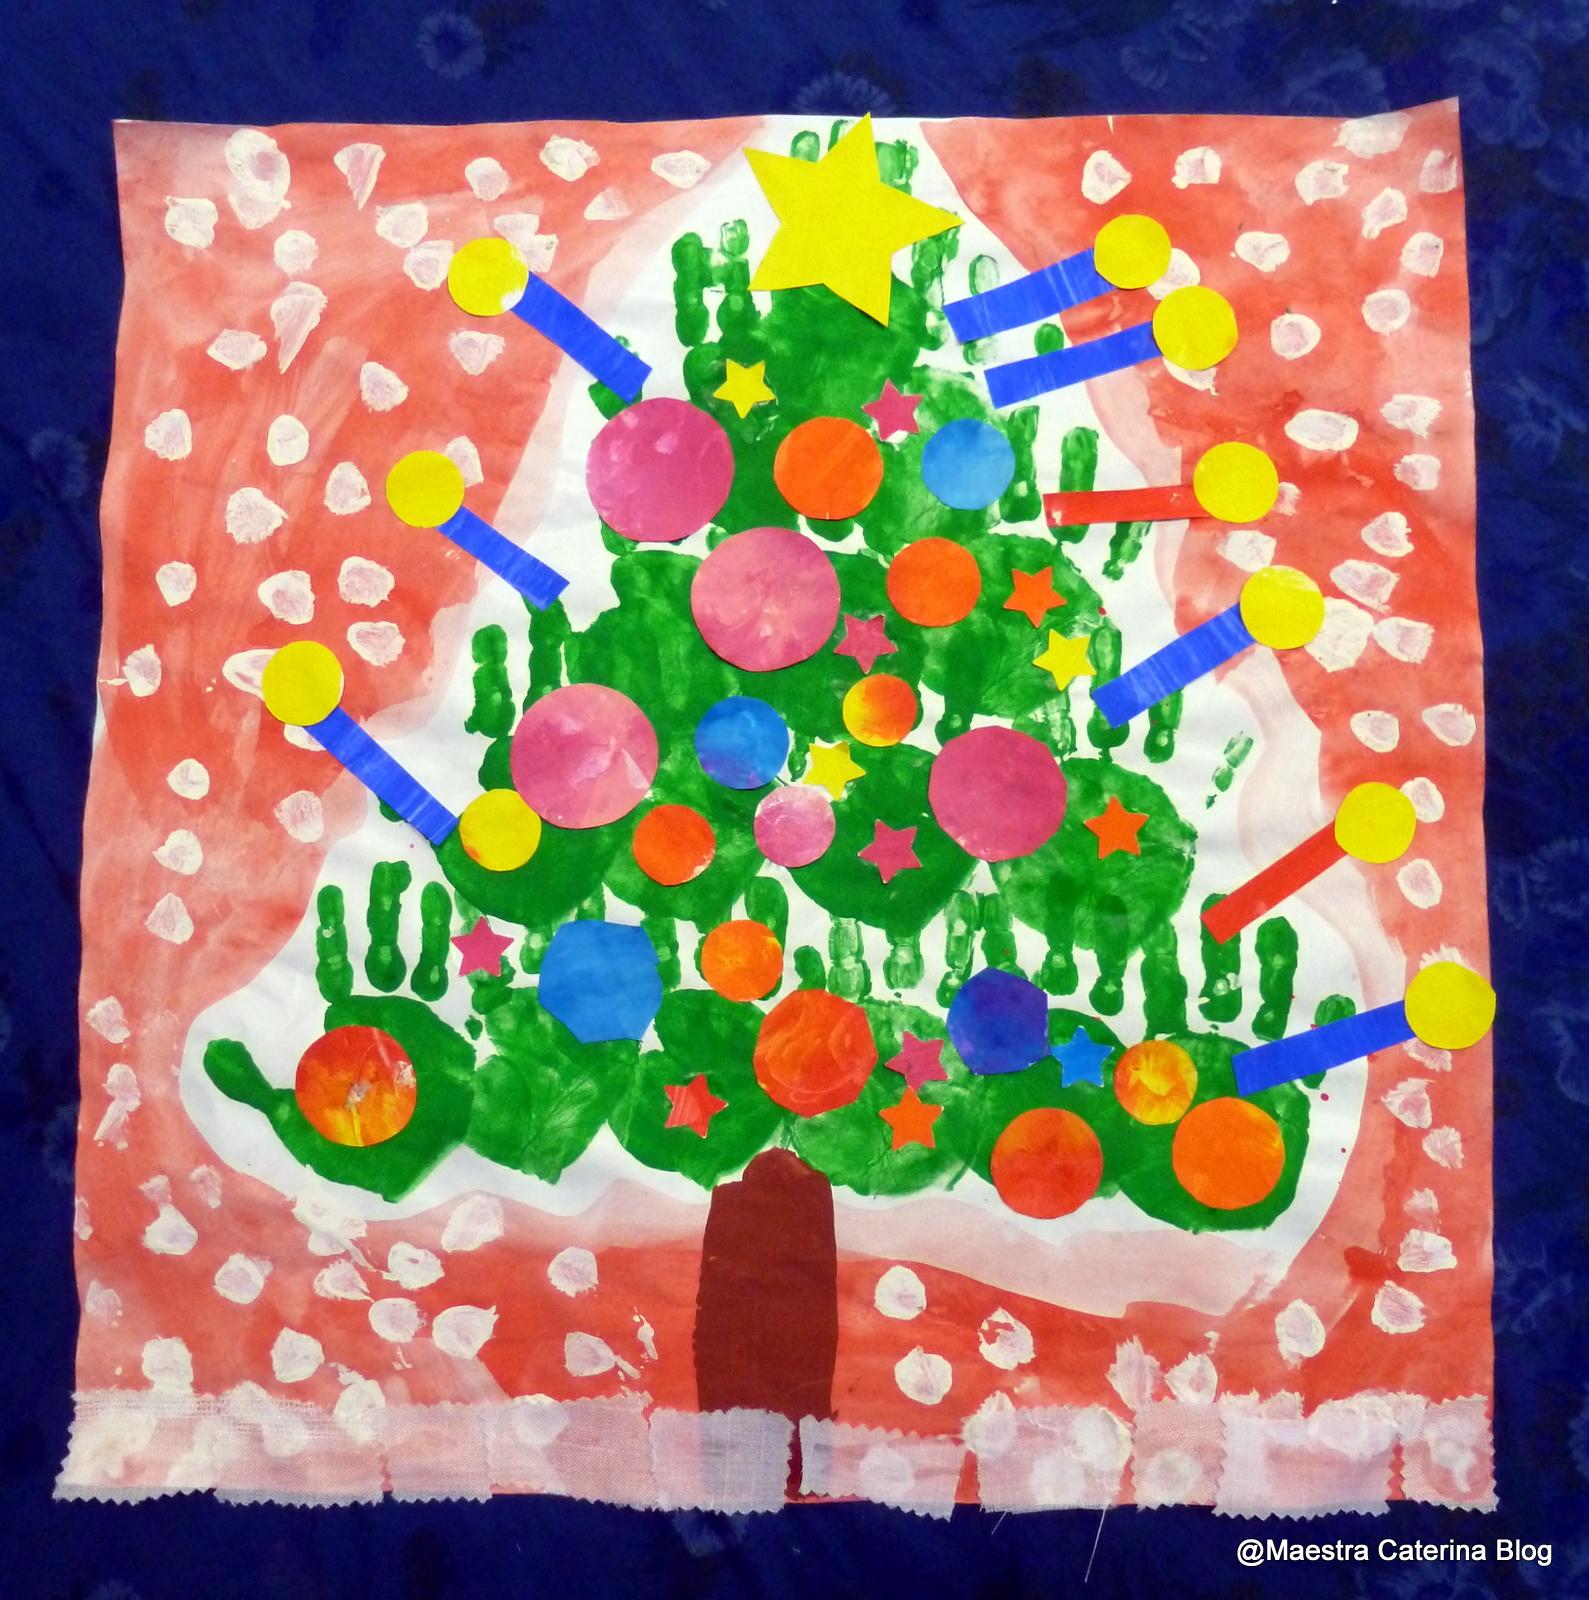 Maestra caterina alberi di natale for Maestra caterina natale